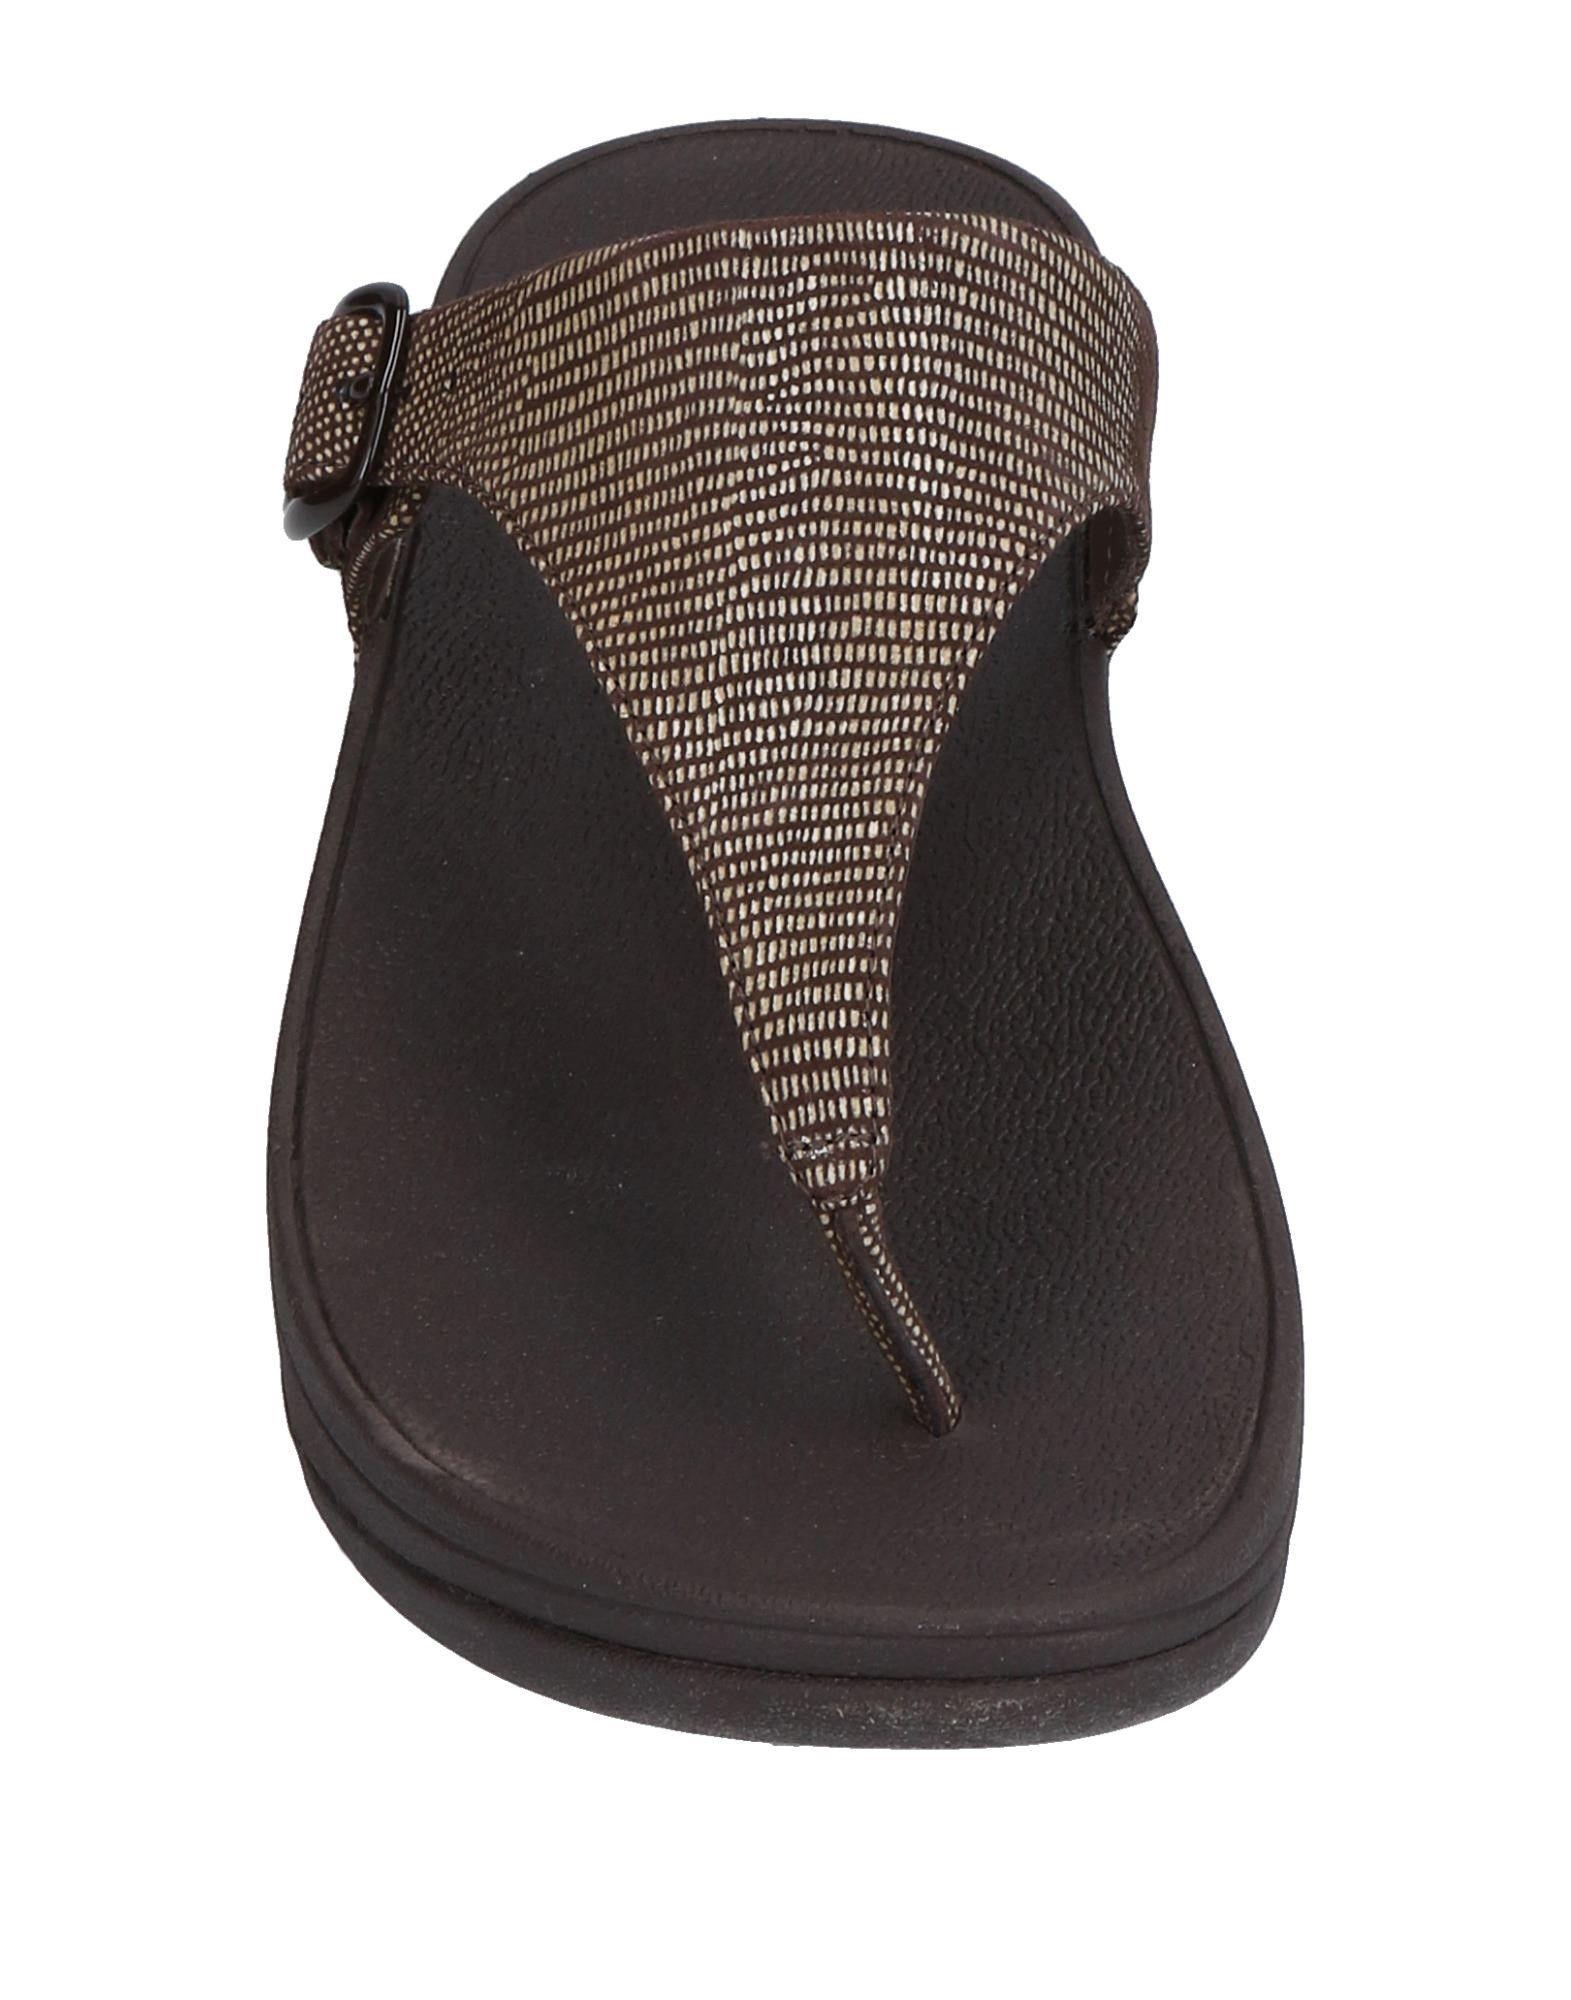 Fitflop Flip Flops Flops Flops - Women Fitflop Flip Flops online on  United Kingdom - 11506490DN 836ca5